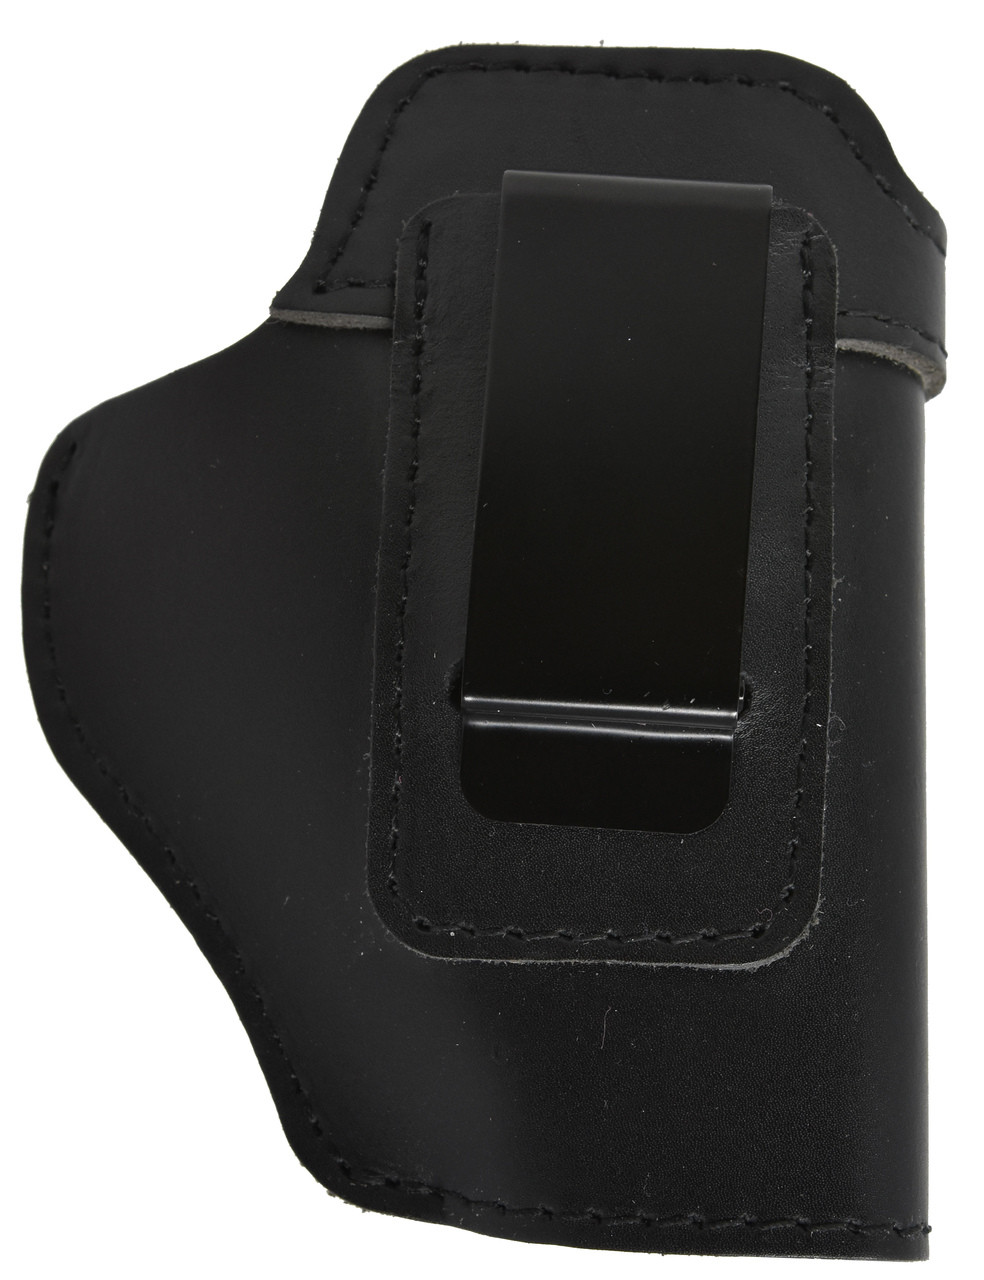 Garrison Grip Black Leather IWB Holster for S&W M&P Shield 40c